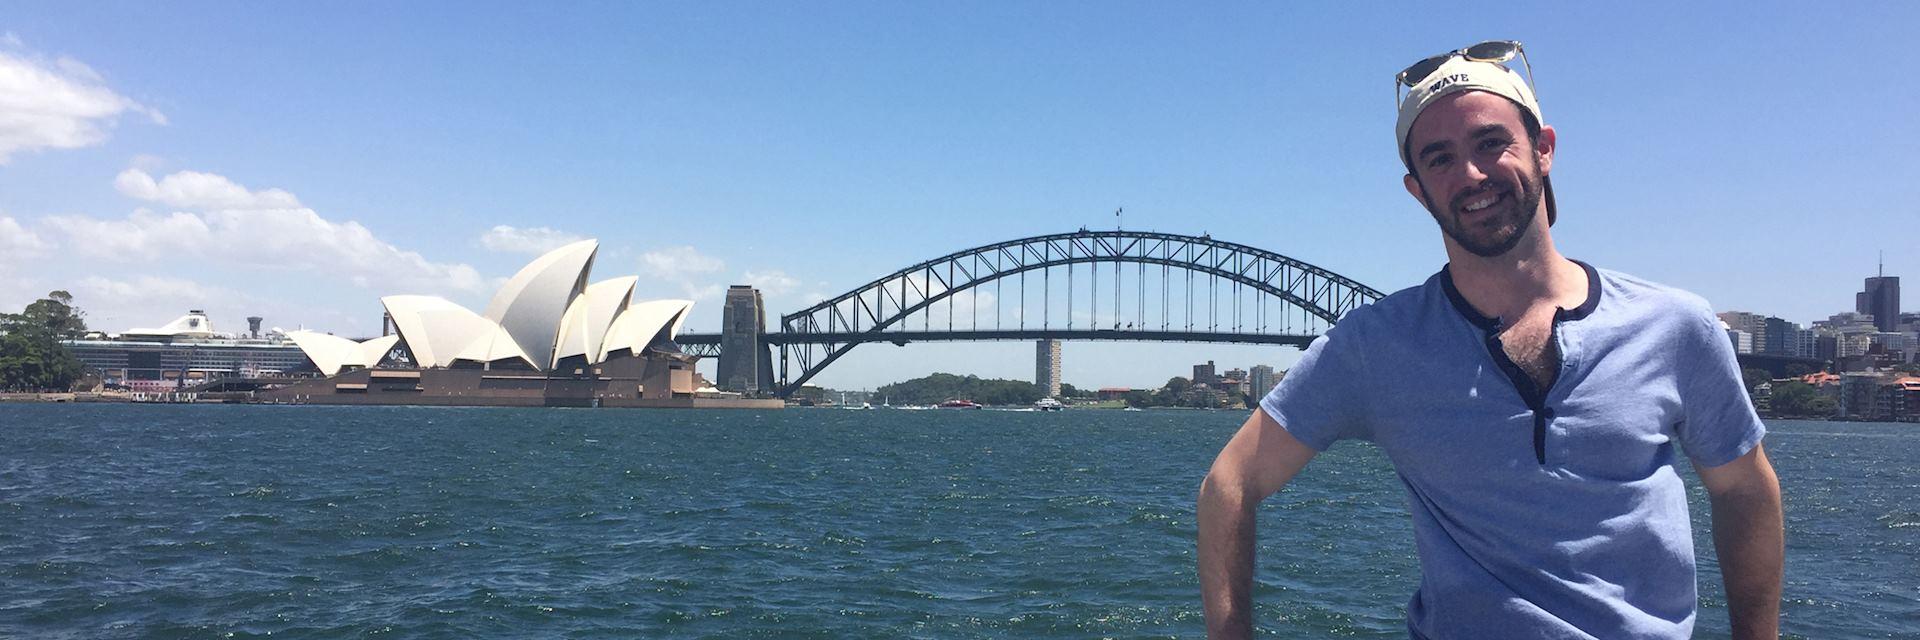 Matt in Sydney, Australia